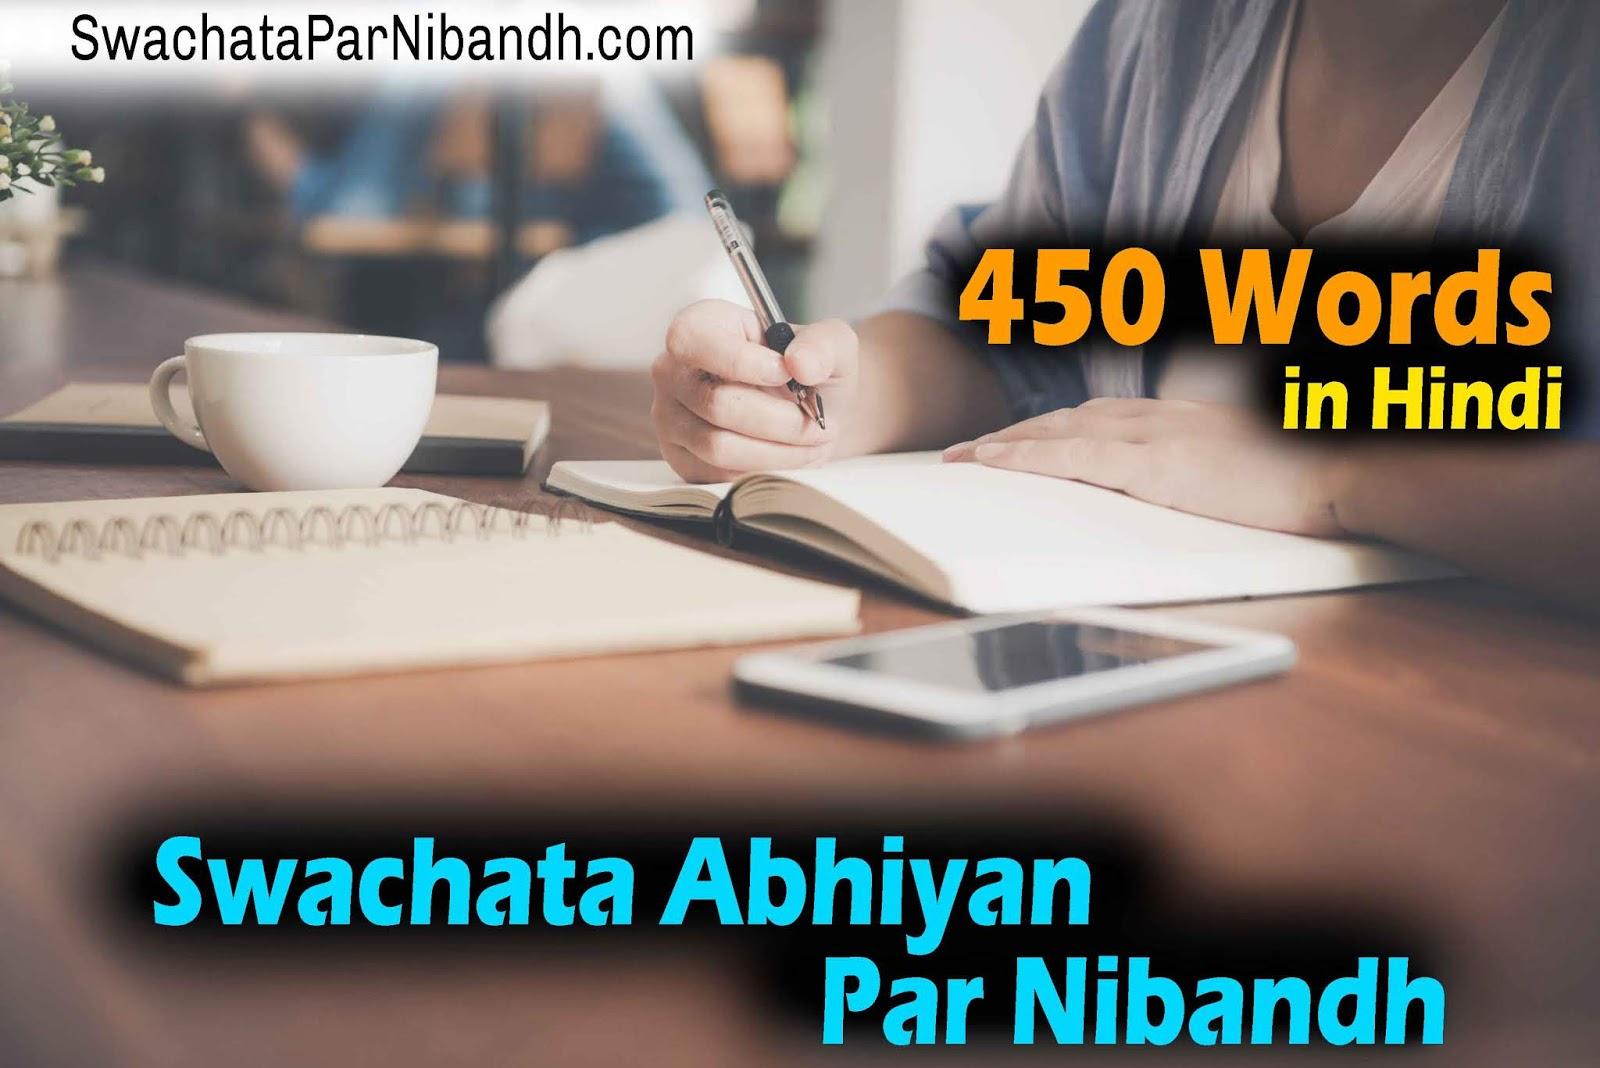 Swachata Abhiyan Par Nibandh, Swachata Abhiyan Par Nibandh Likhna Hai, Swachata Abhiyan Par Nibandh Short, Swachata Par Essay In Hindi, Swachata Par Nibandh, Swachata Par Nibandh Hindi Mein,